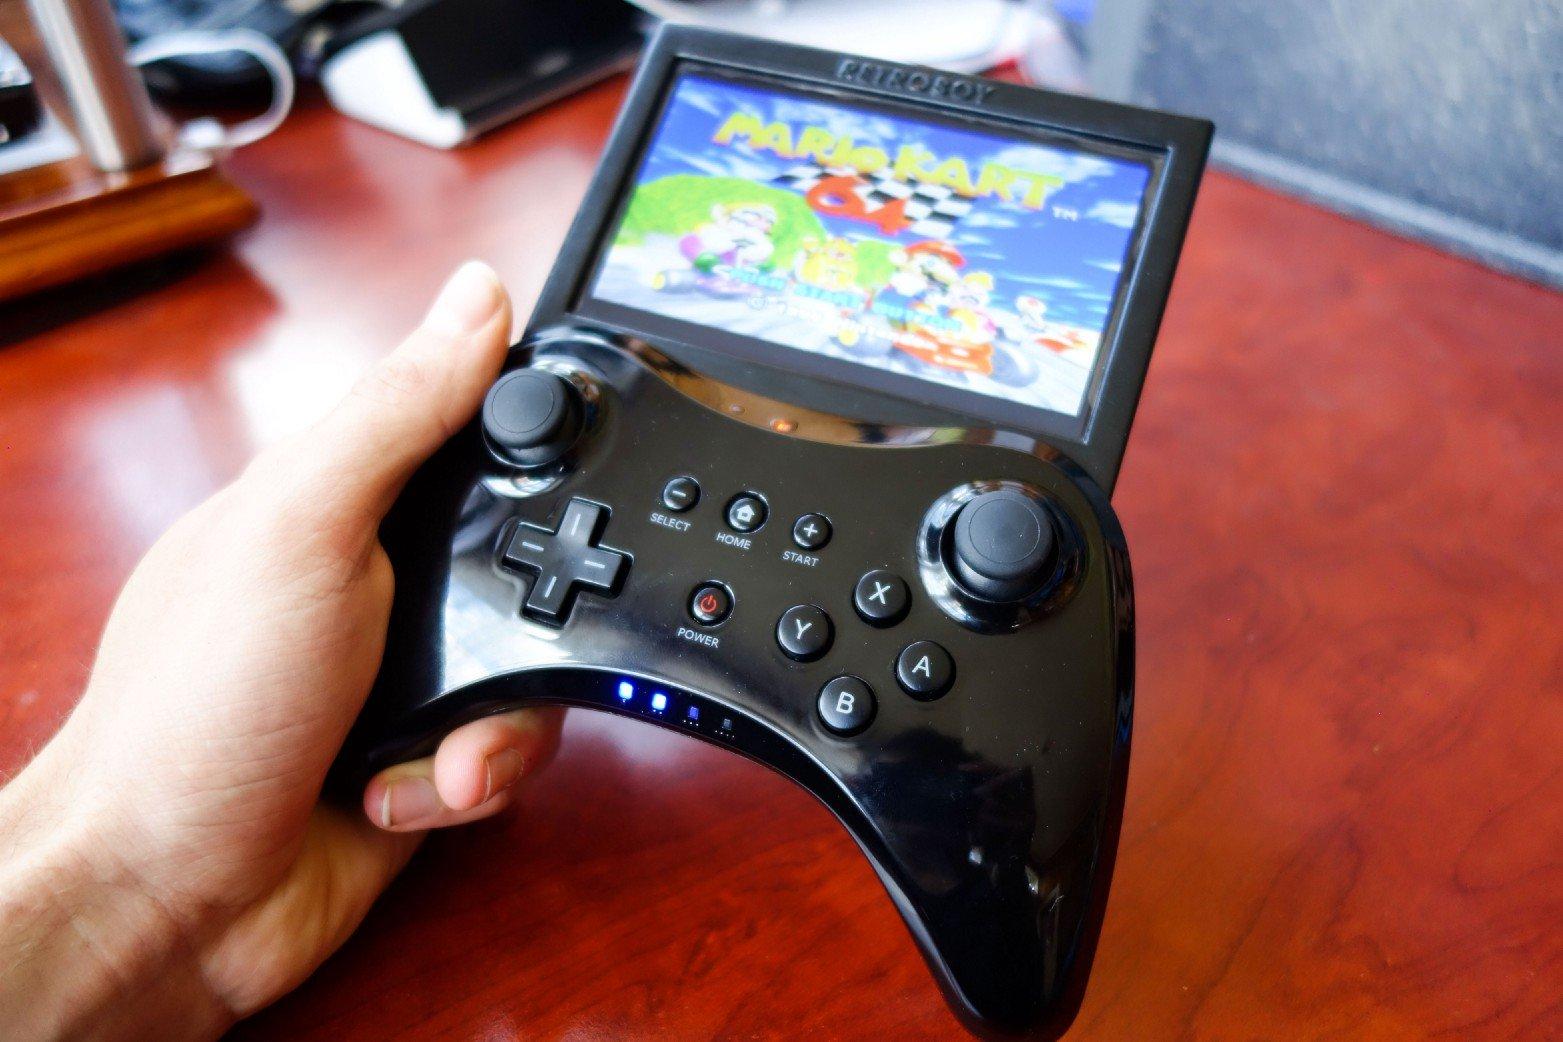 Homemade RetroPie Gaming Device Modded into Wii U Pro